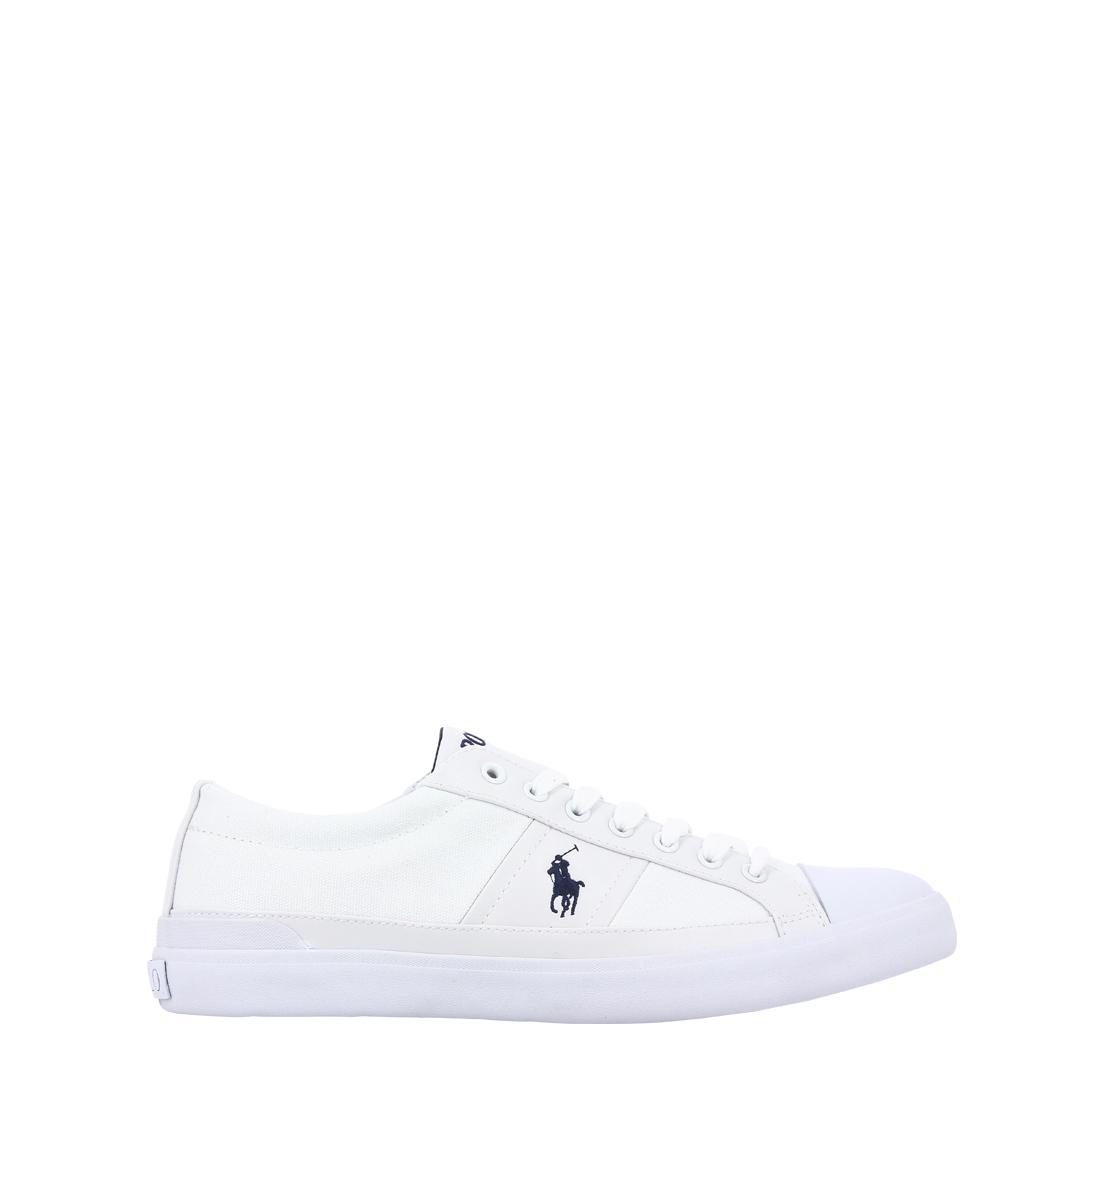 Polo Ralph Lauren Baskets basses Hanford suédé Beige clair Homme  Chaussures,chaussure ralph lauren,blouson ralph lauren,soldes magasin 27e7f840b19